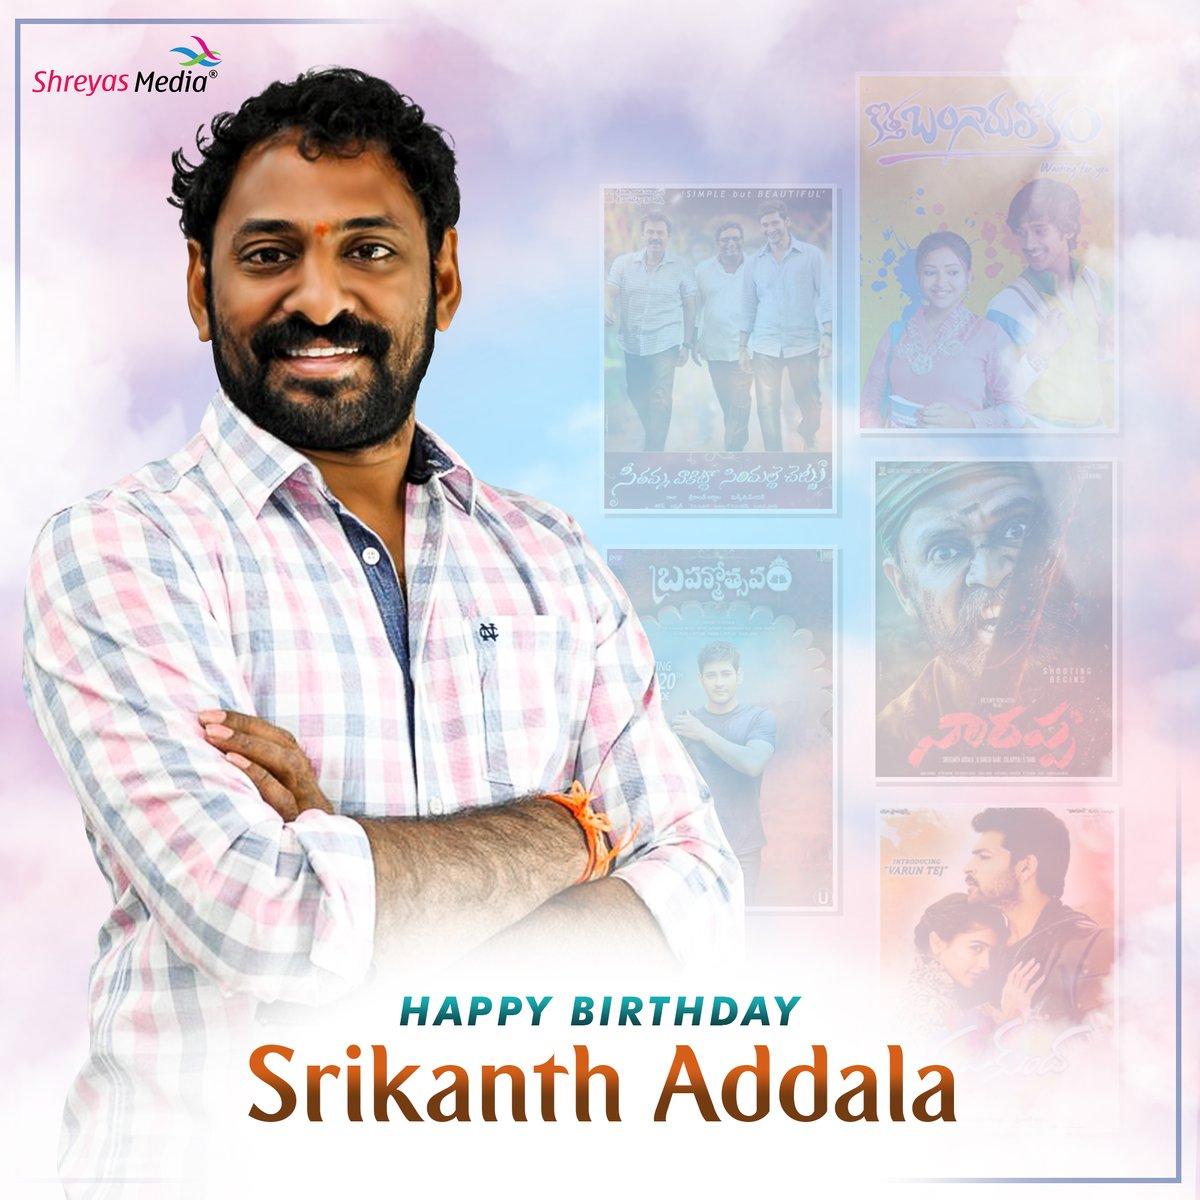 Happy Birthday #SrikanthAddala gaaru🎉 from #ShreyasMedia #Shreyasgroup https://t.co/izunm9vTEU